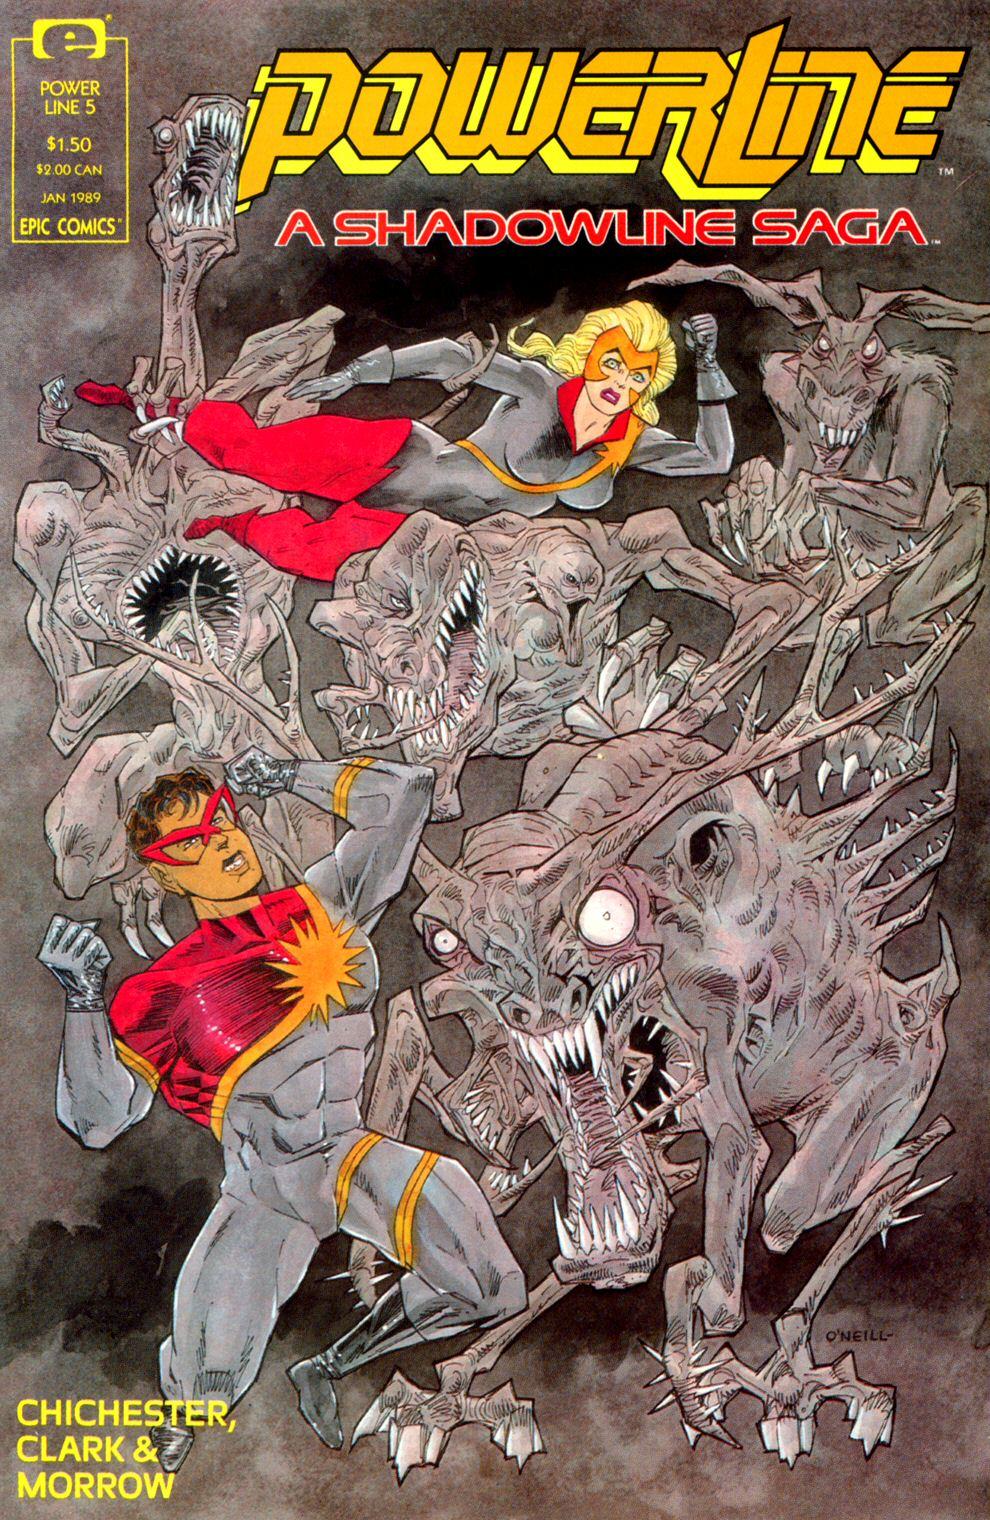 Read online Powerline comic -  Issue #5 - 1